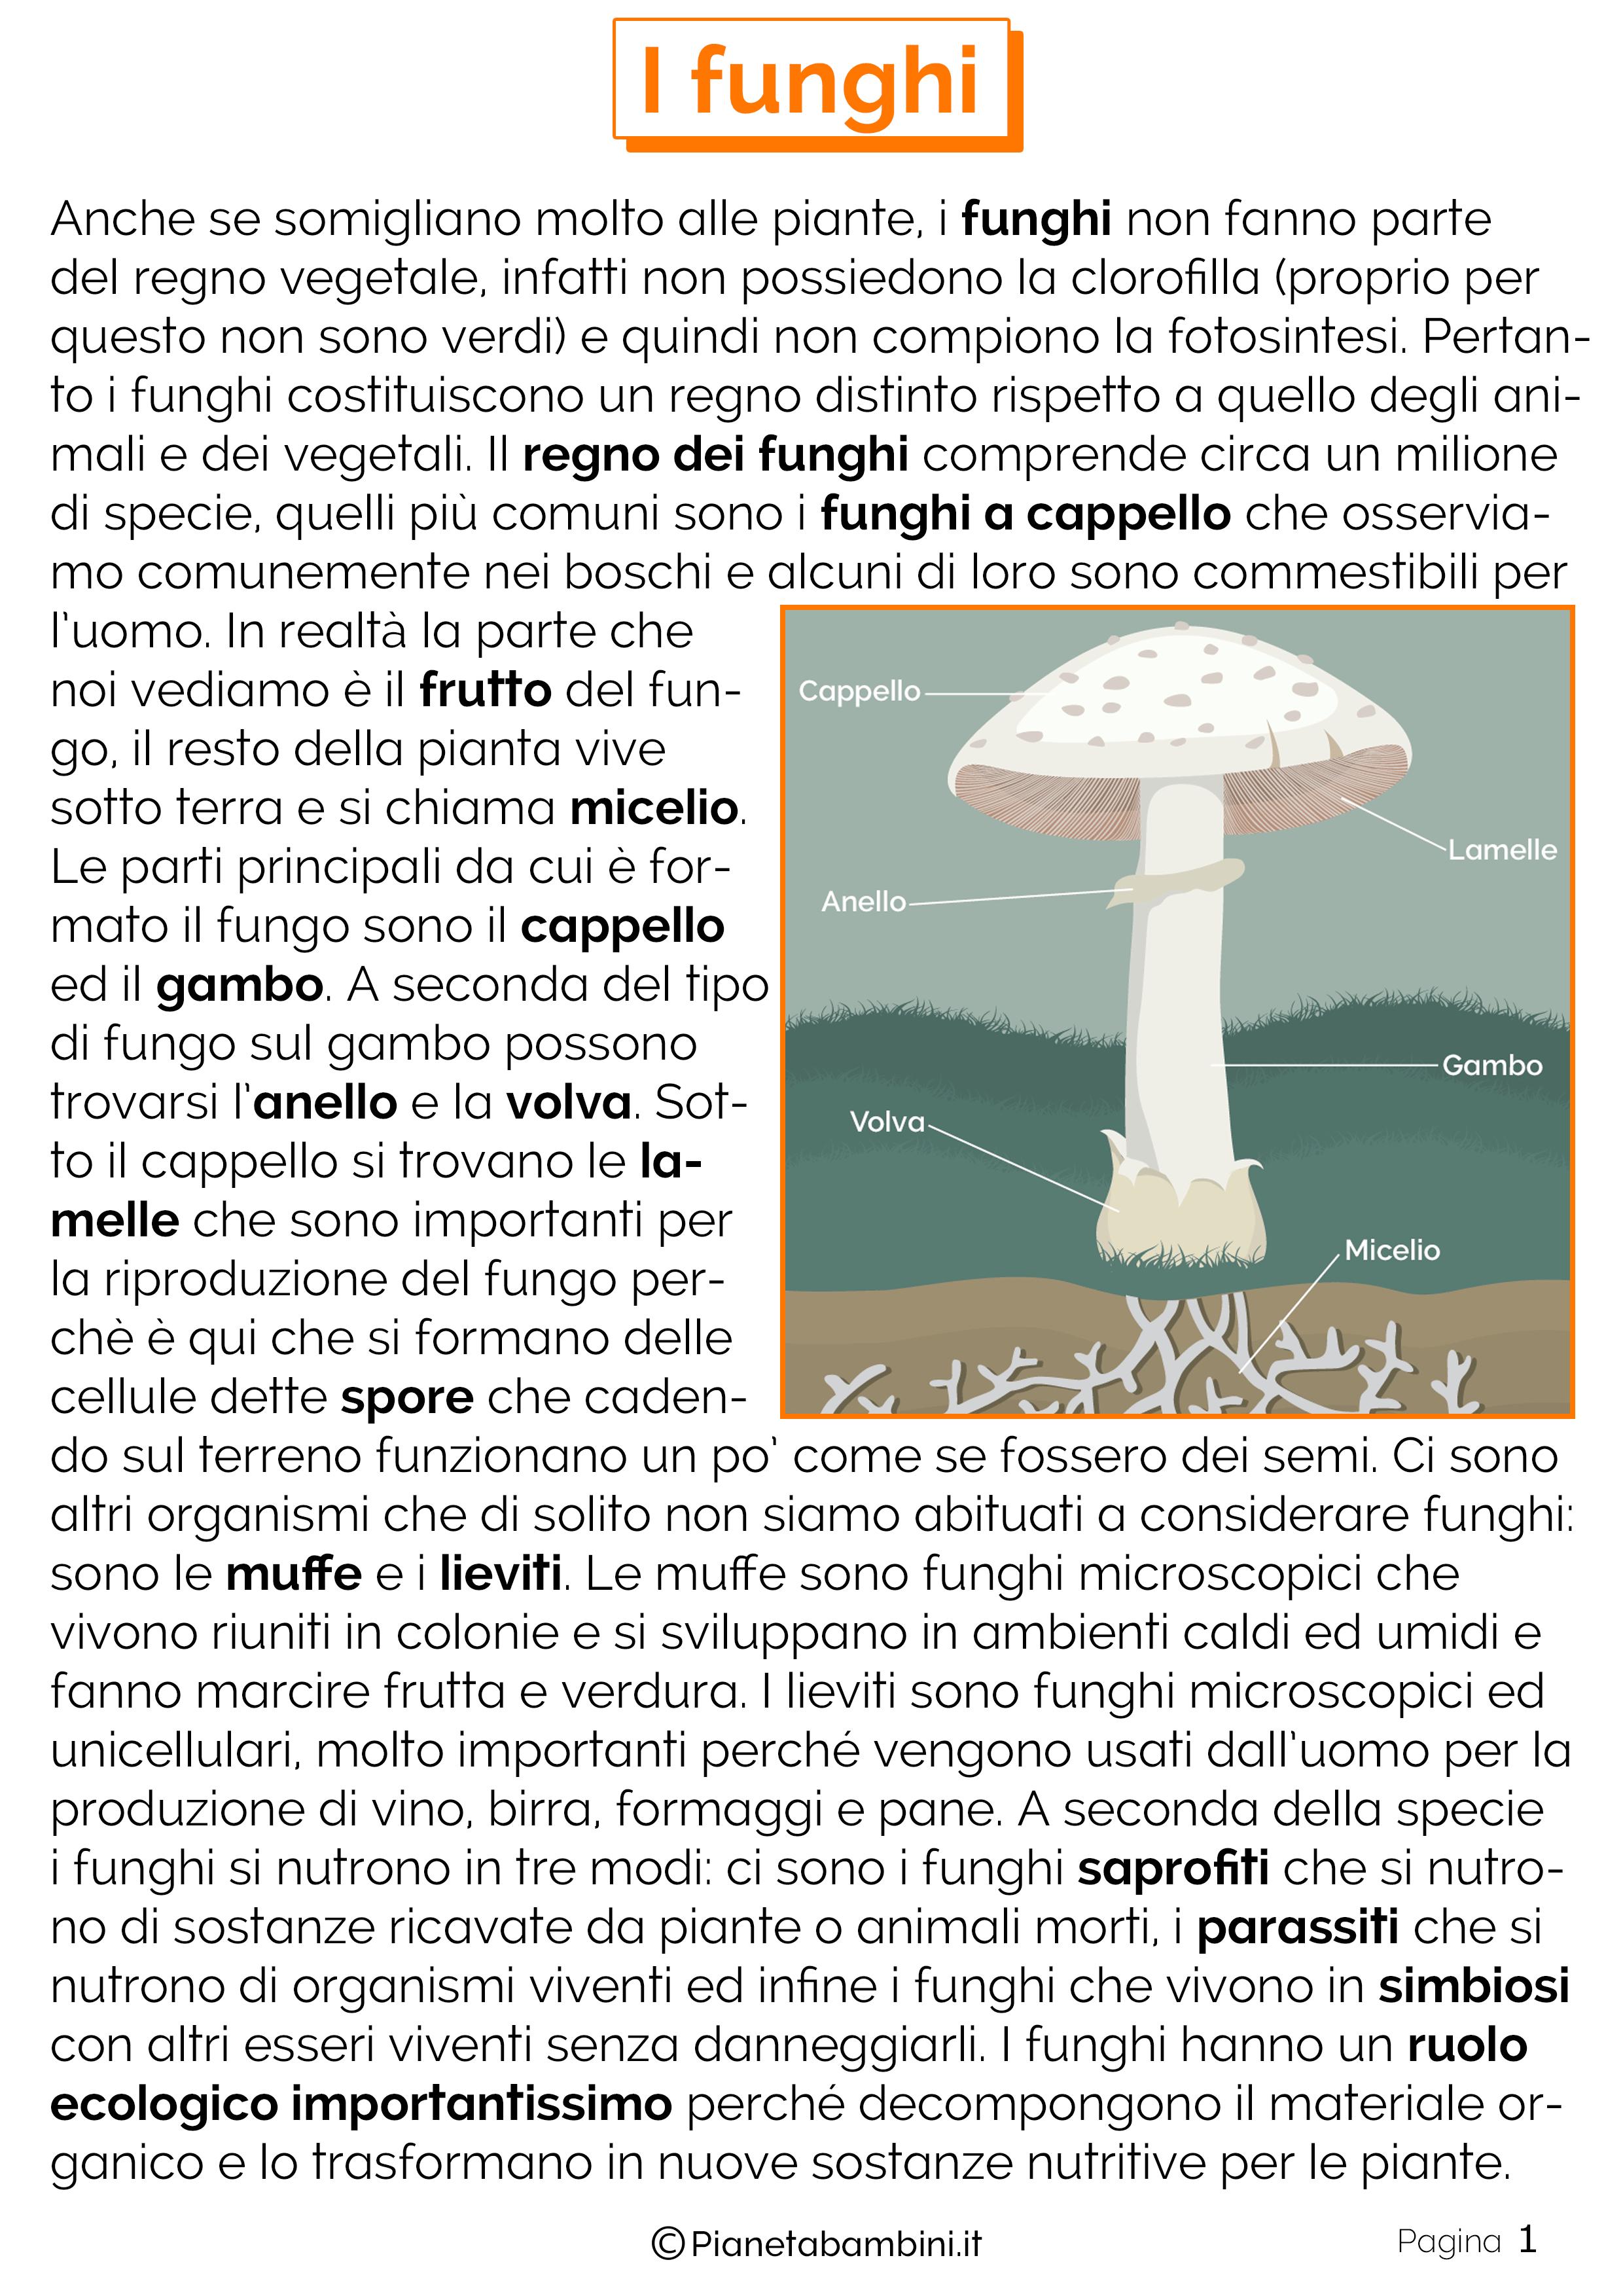 Teoria sui funghi